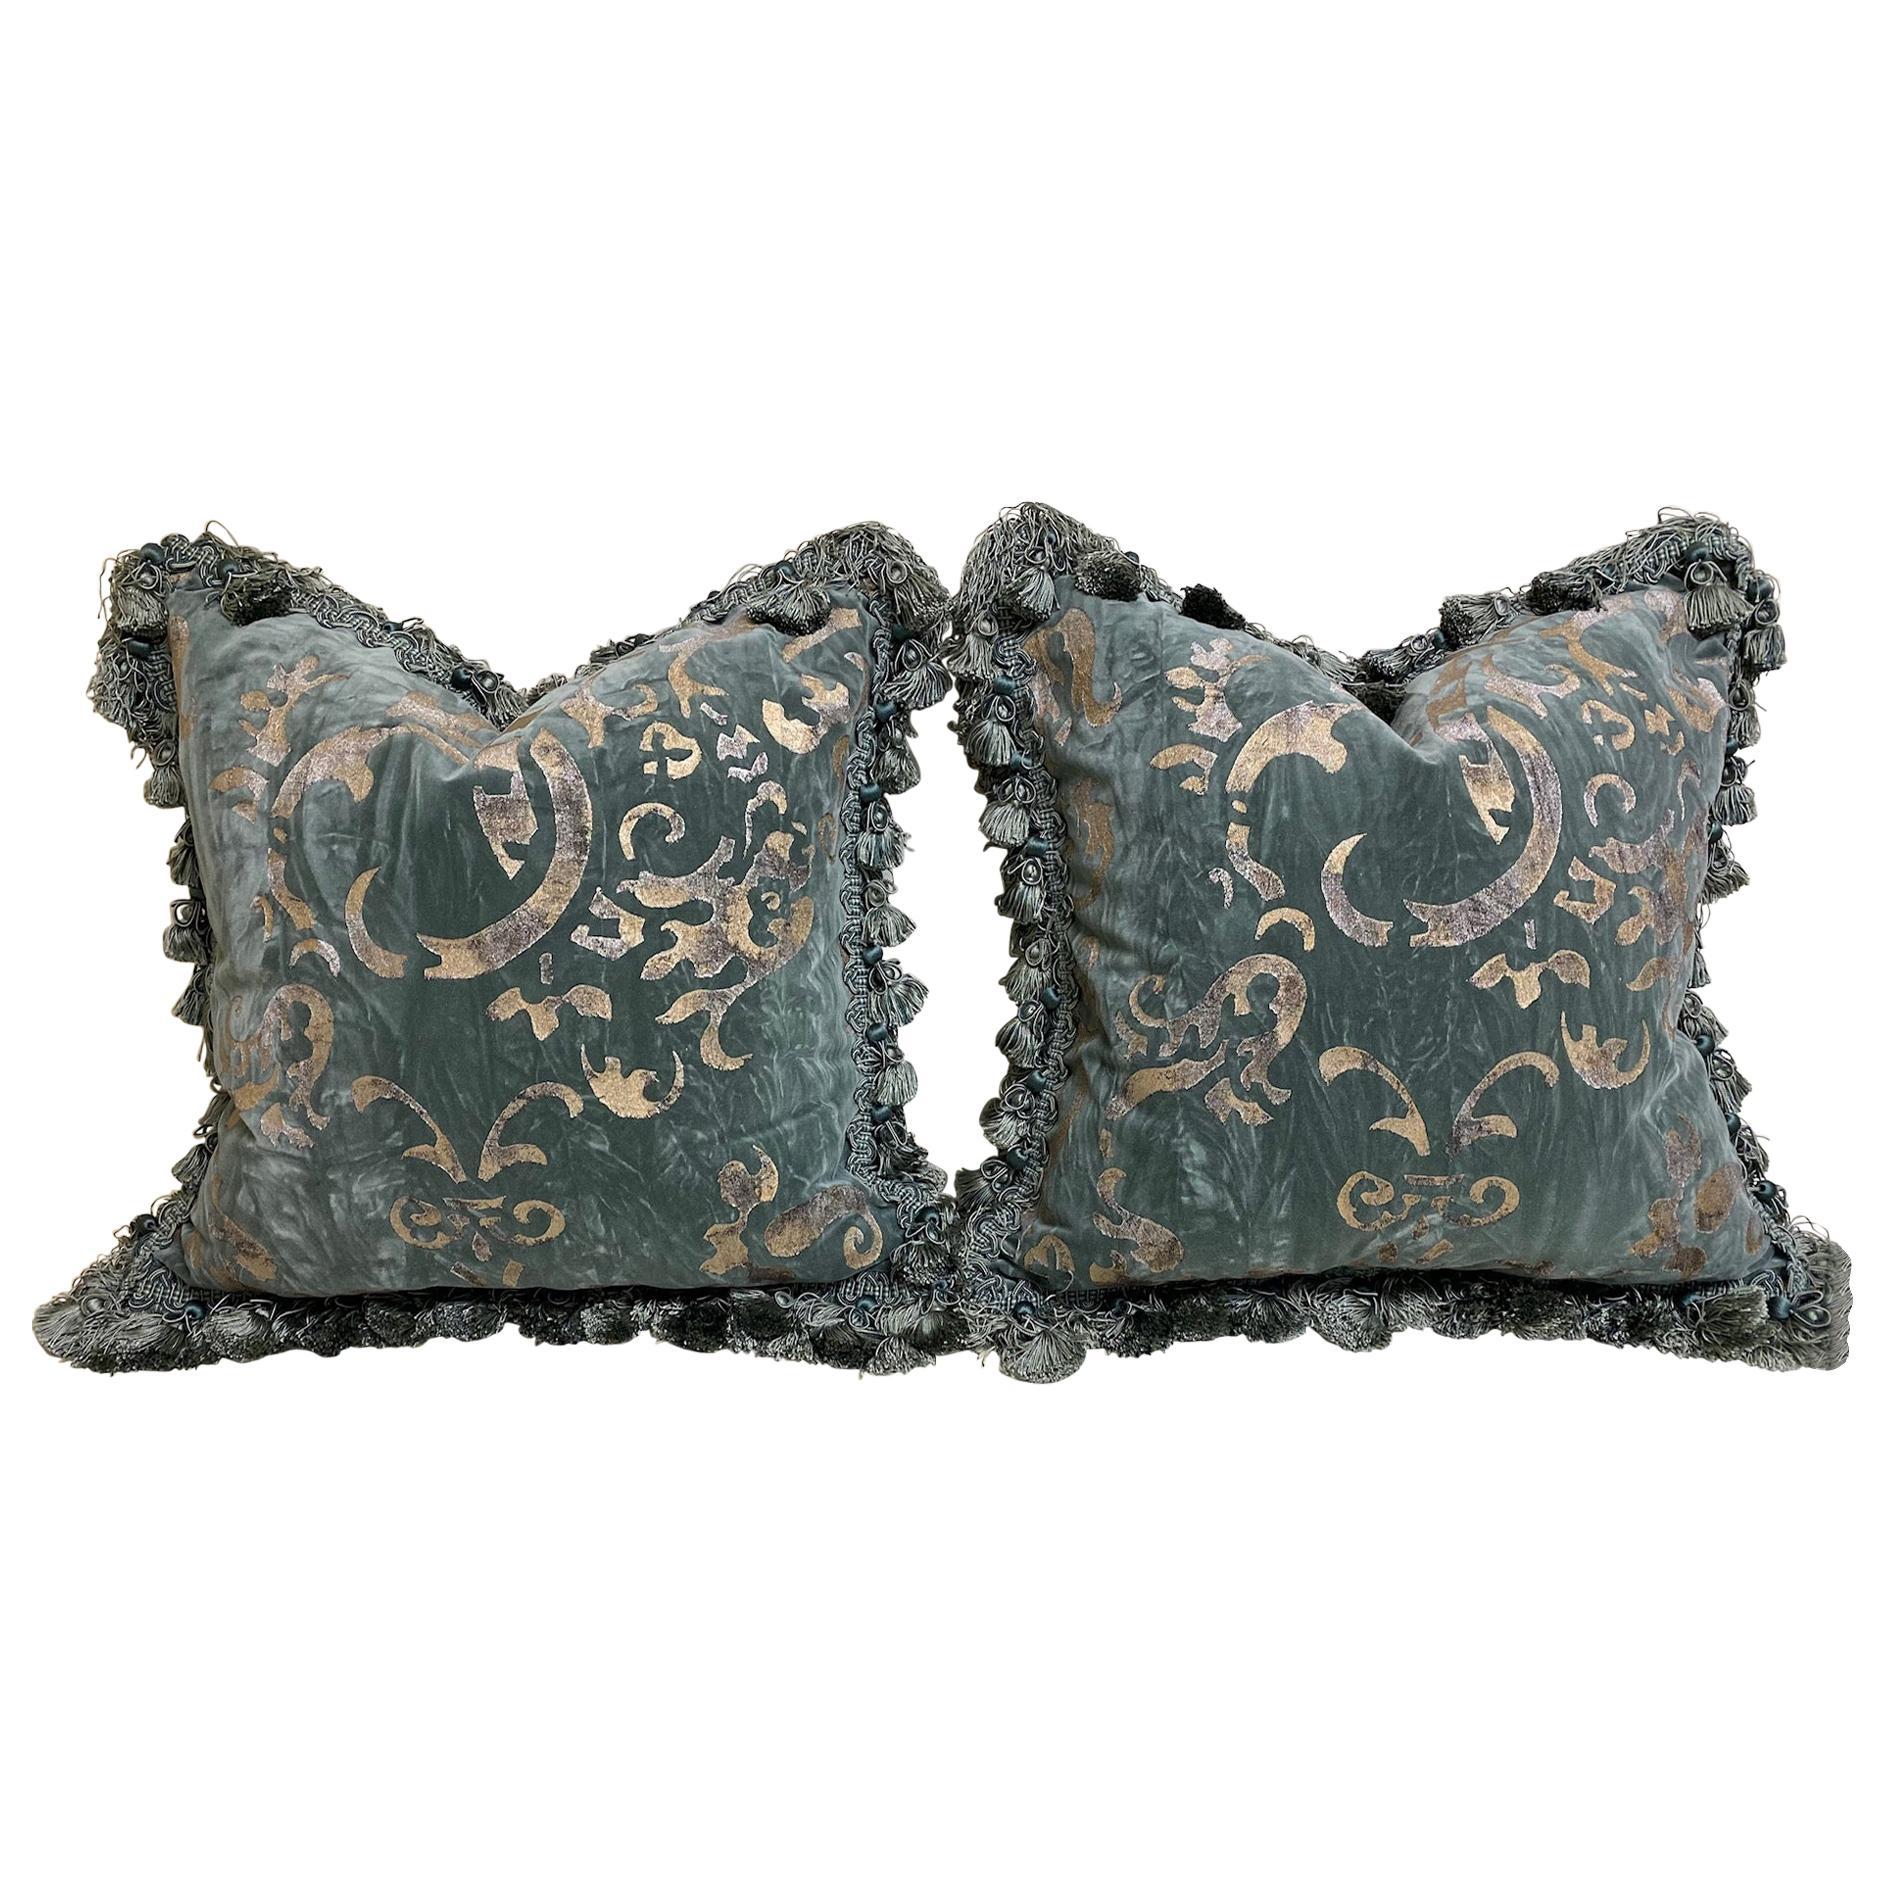 Pair of Gaufrage Velvet Cushions